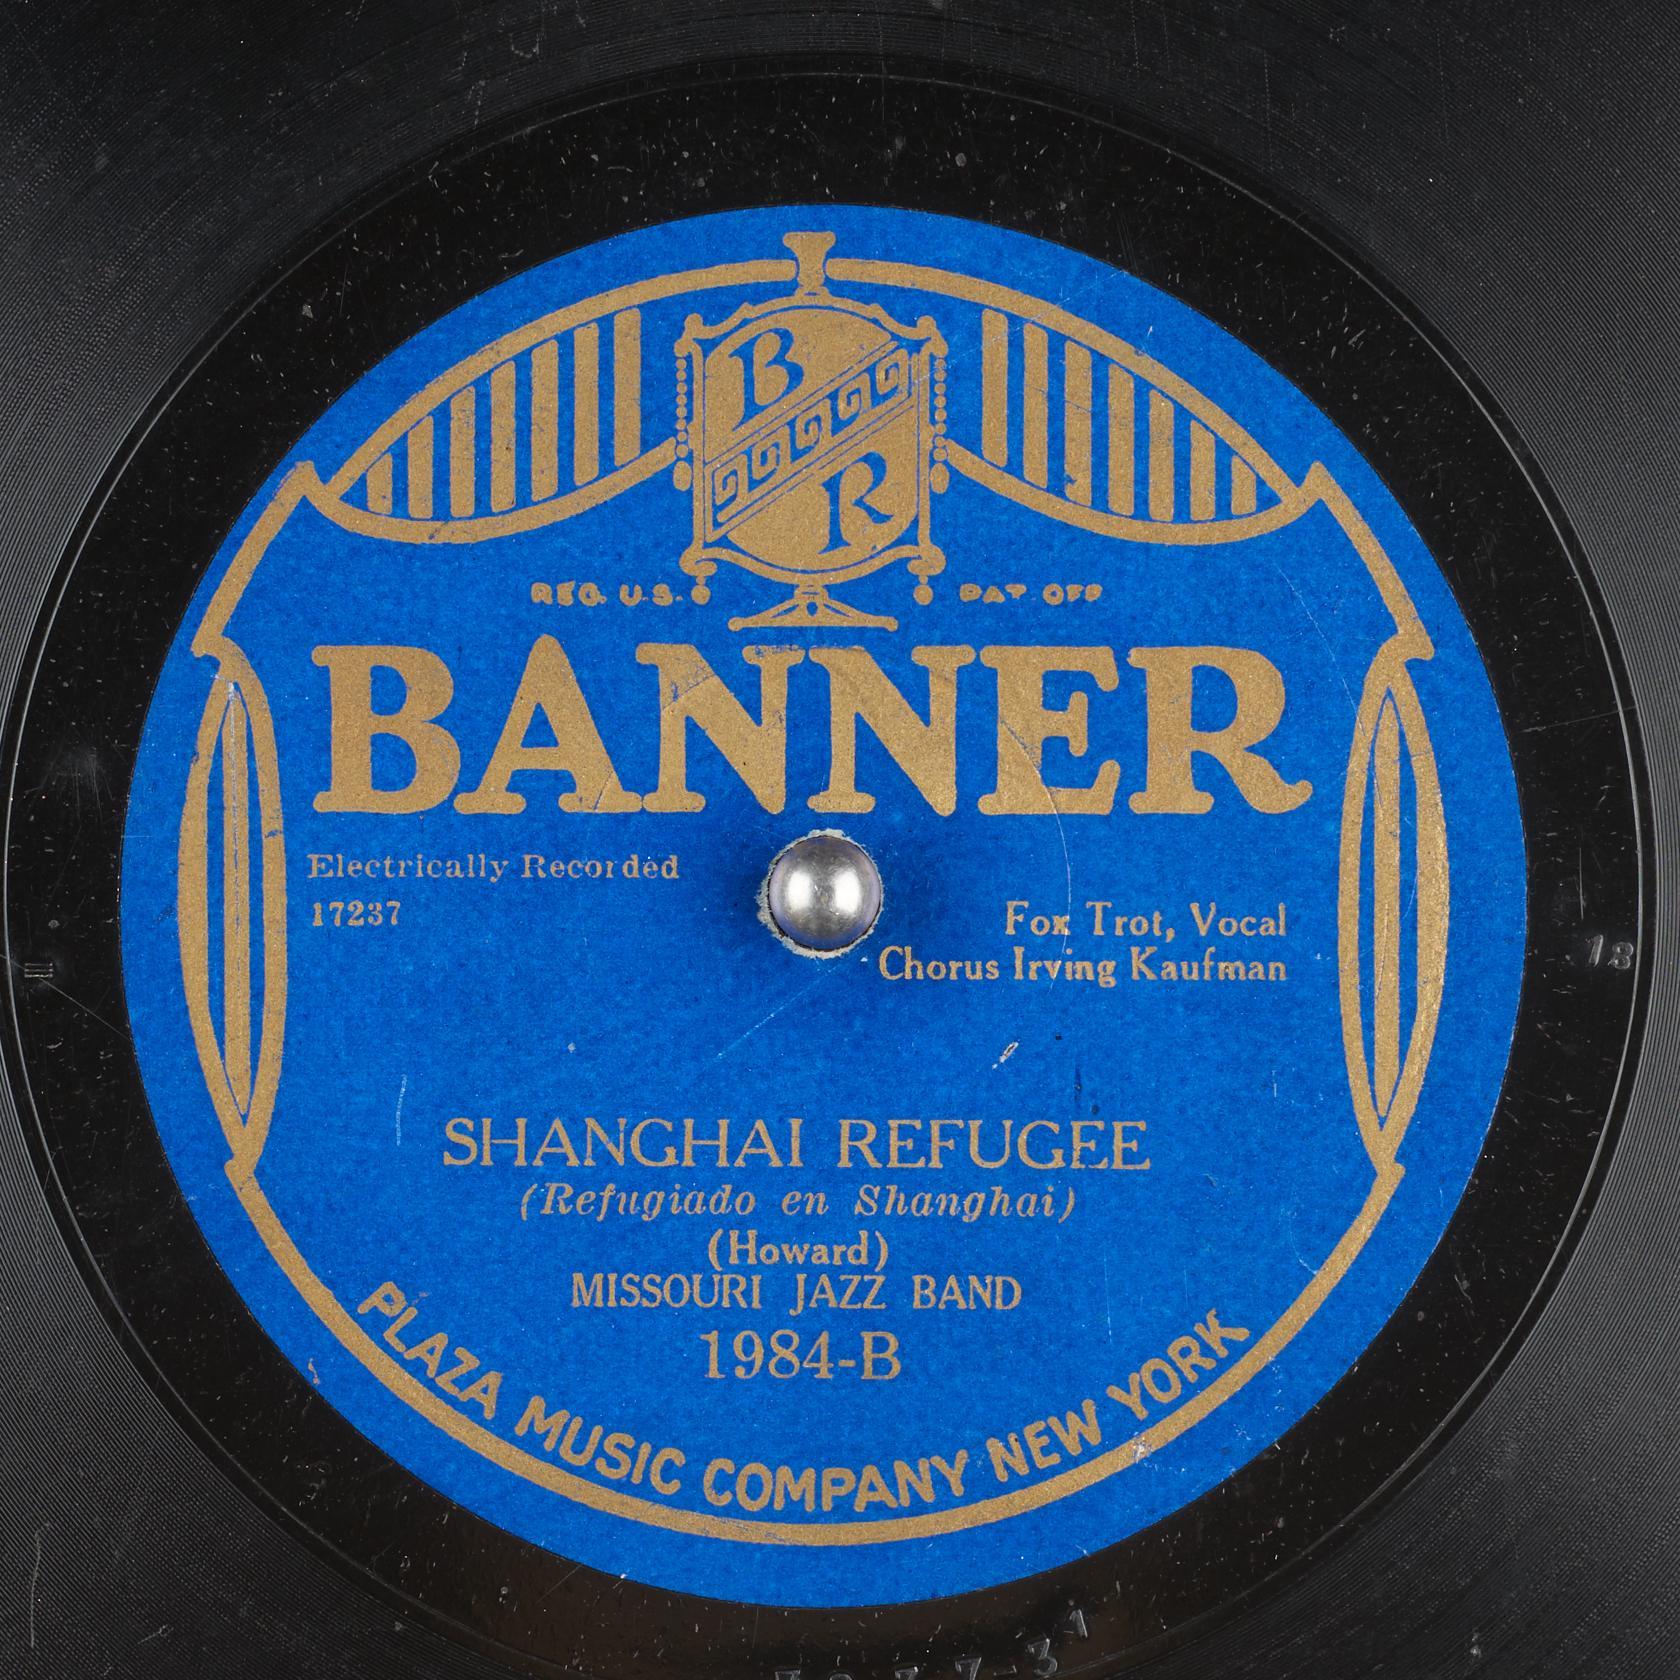 78_shanghai-refugee-refugiado-en-shanghai_missouri-jazz-band-irving-kaufman-howard_gbia0072375b_itemimage.jpg